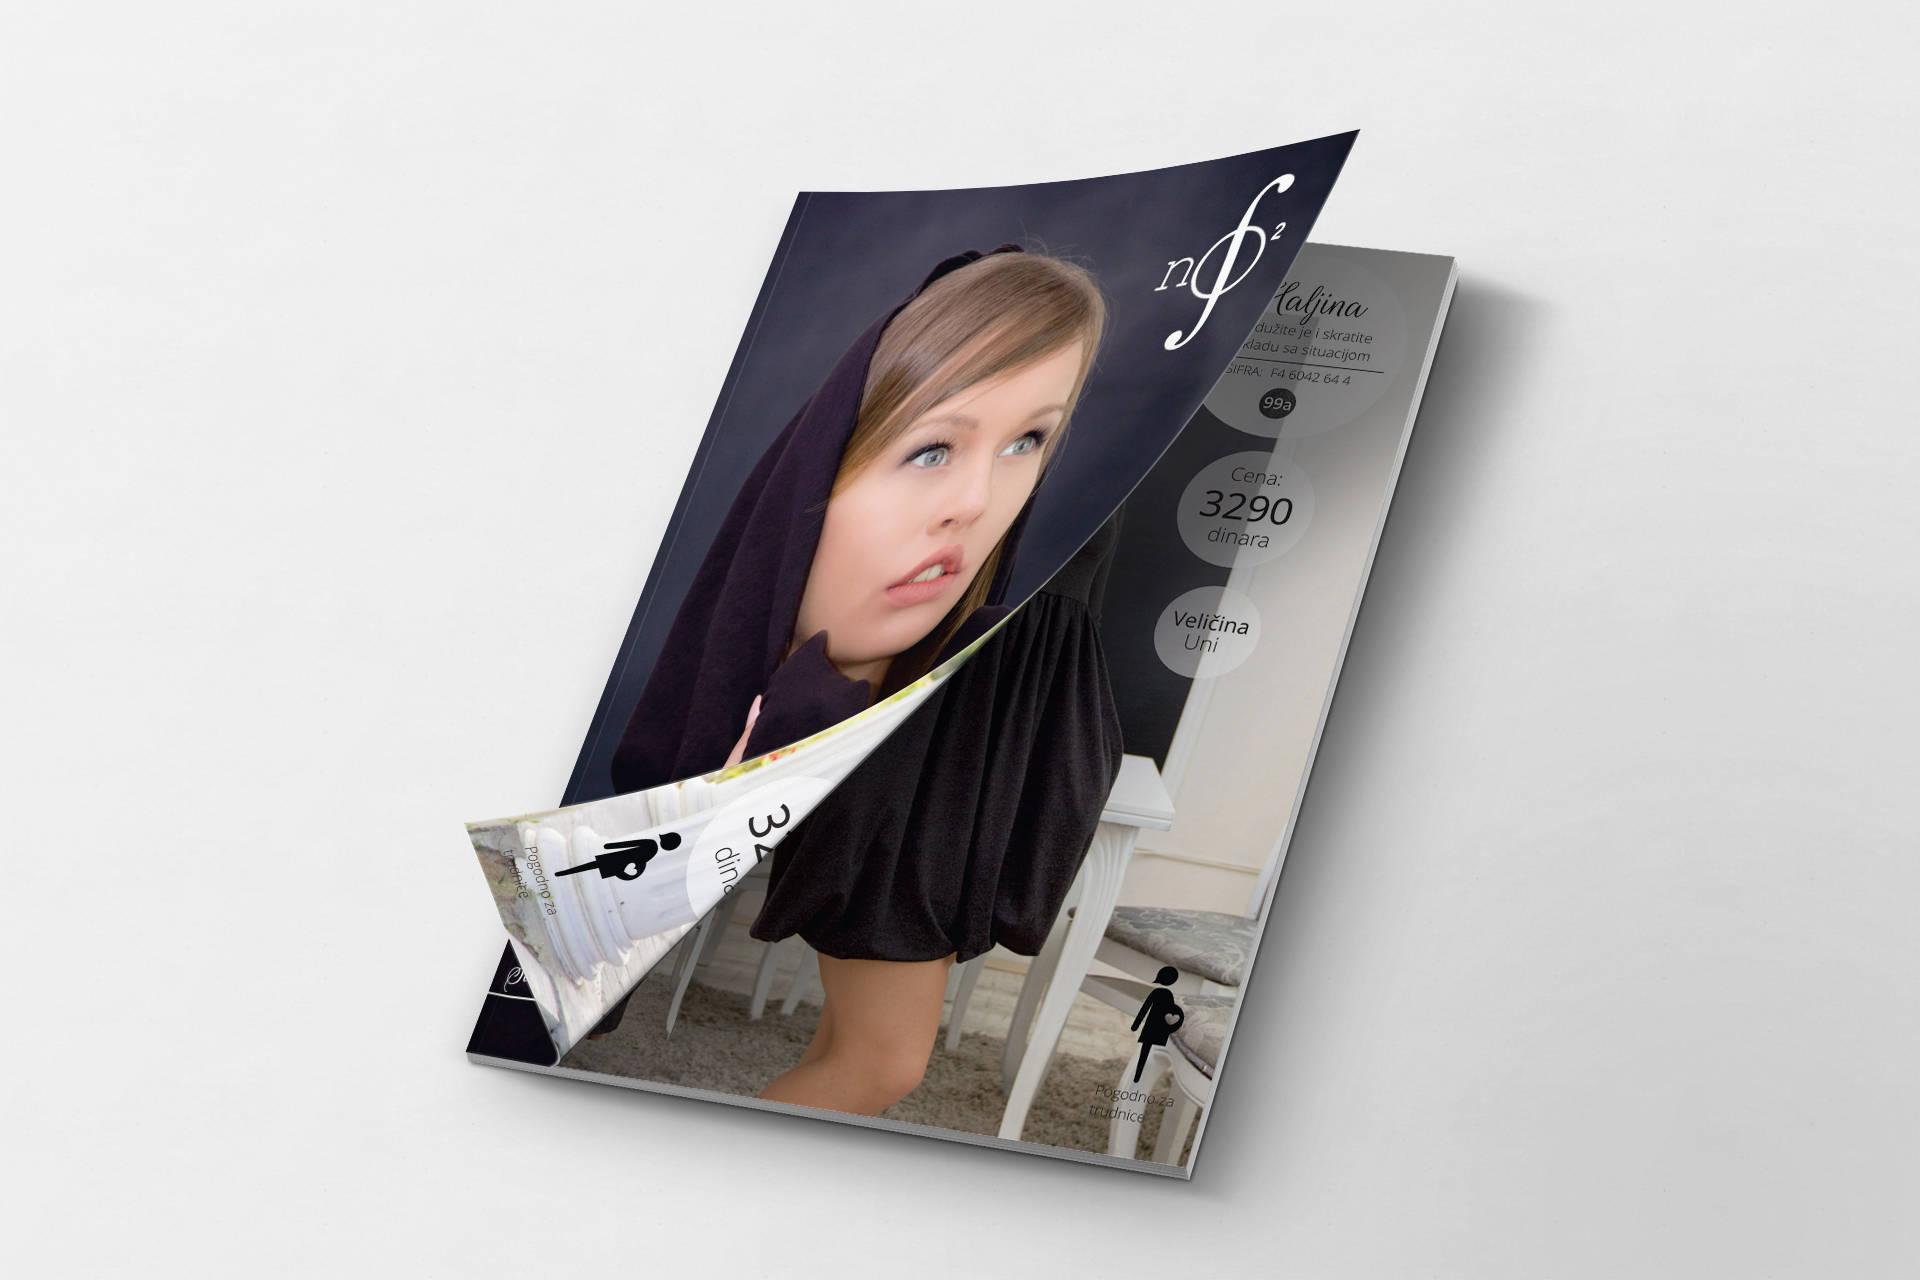 Katalog za NO-NO Factory za jesen/zimu 2015 unutrašnje strane